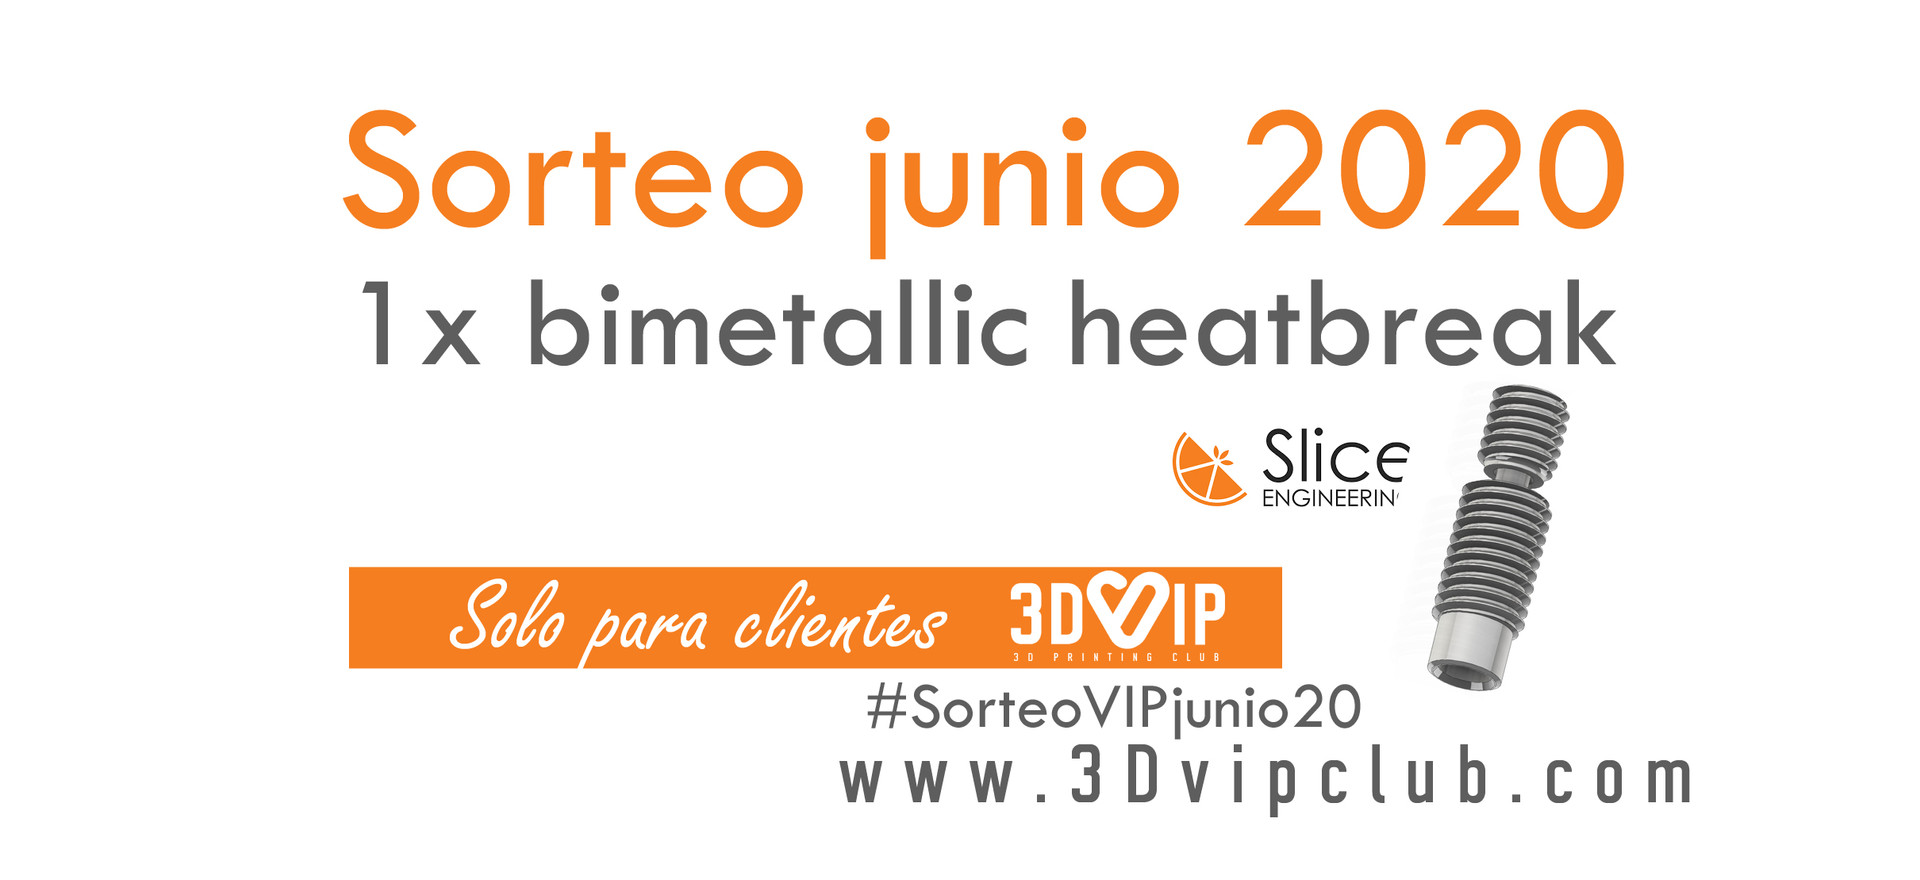 SORTEO JUNIO 2020